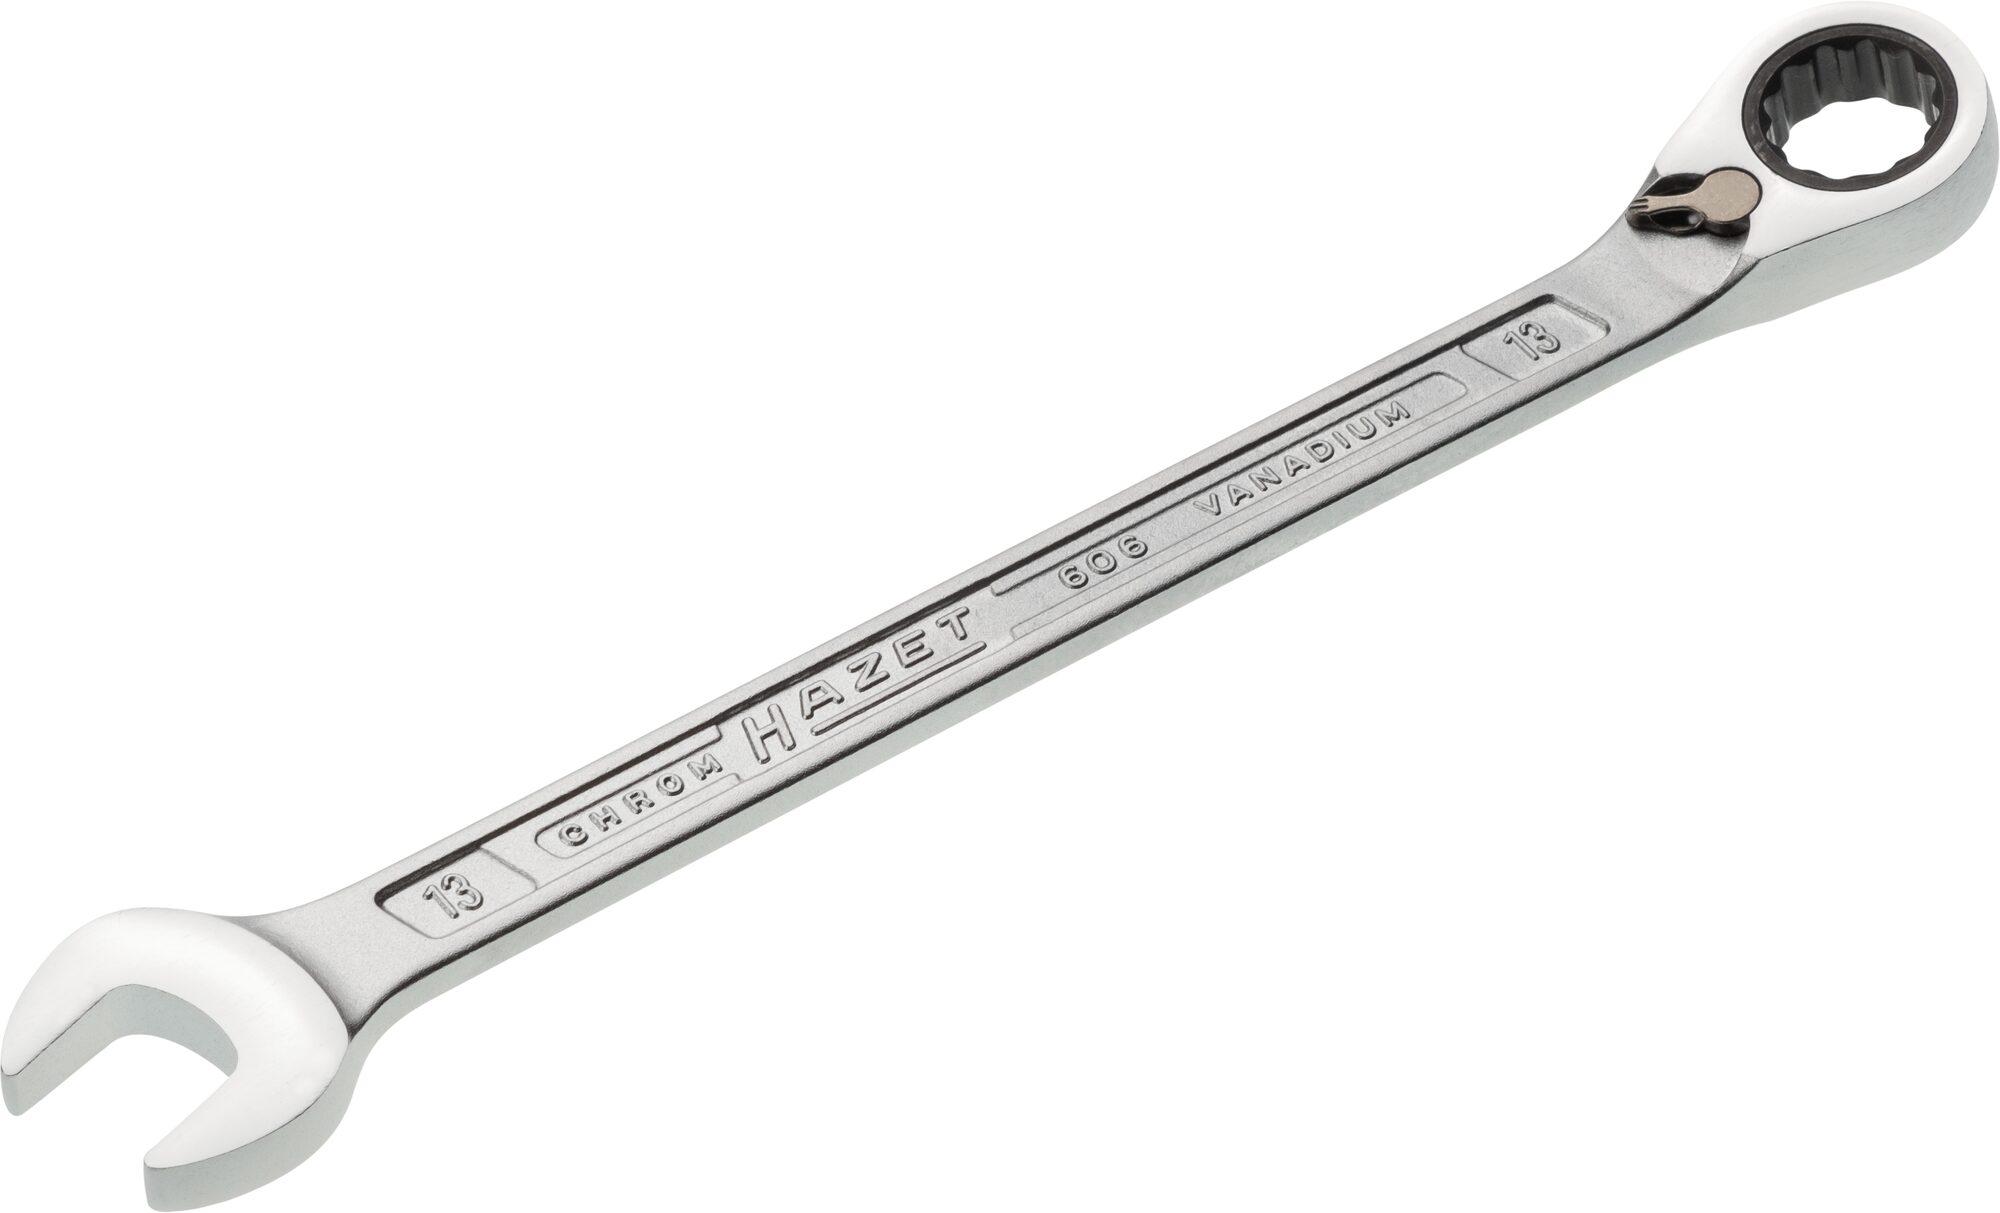 HAZET Knarren Ring-Maulschlüssel 606-13 ∙ Außen-Doppel-Sechskant-Tractionsprofil ∙ 13 mm